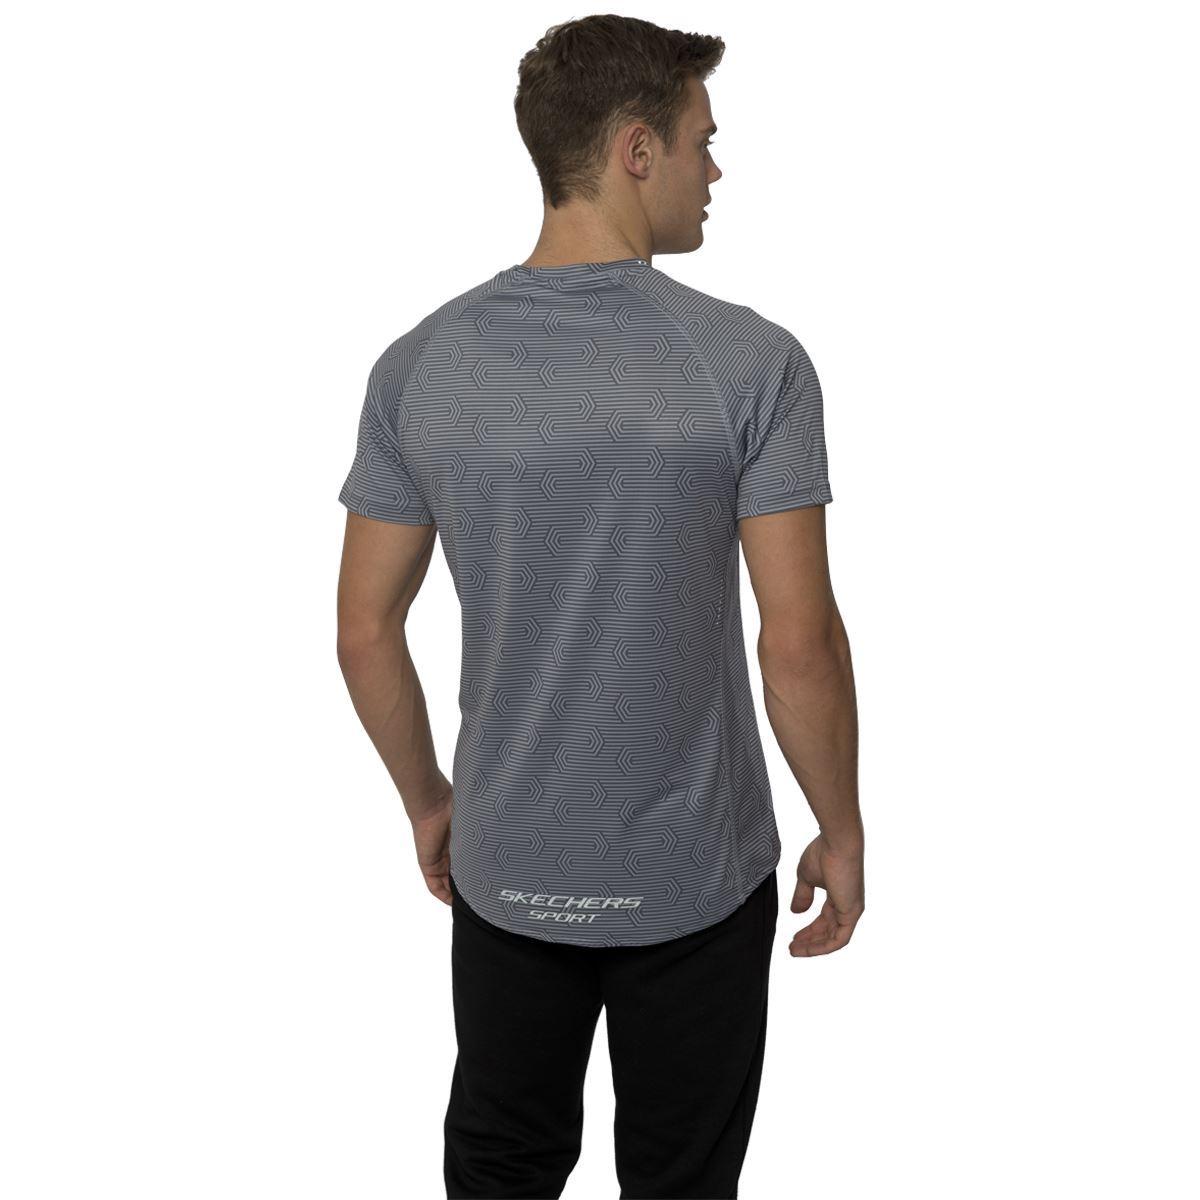 Skechers mens sports t shirt graphic geo print tee raglan for Xxl tall graphic t shirts